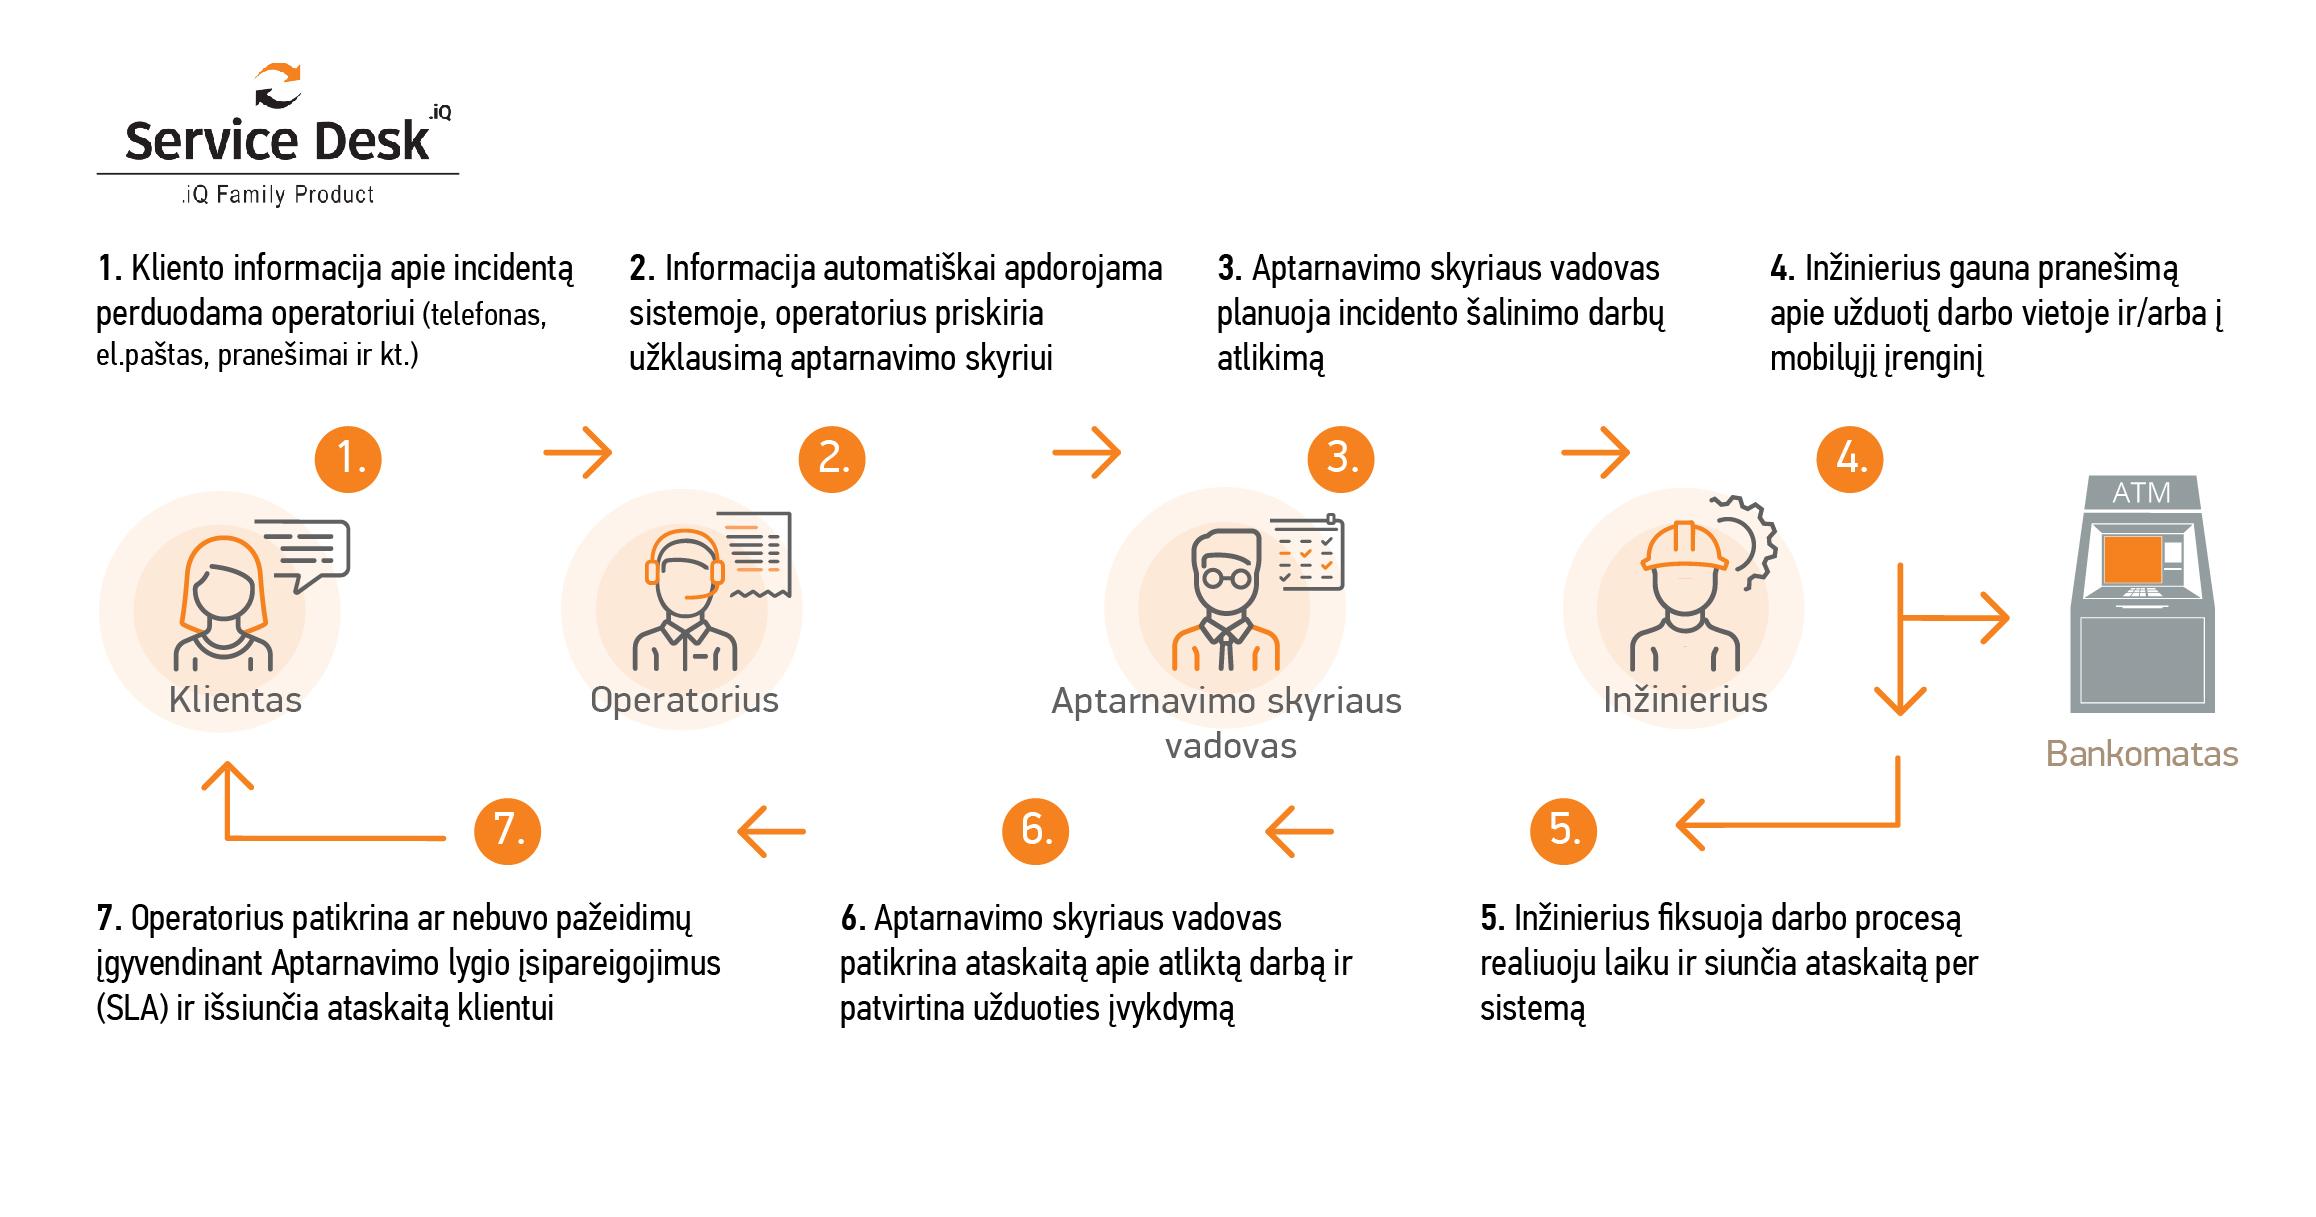 prekybos automatisches handelssystem programinė įranga)